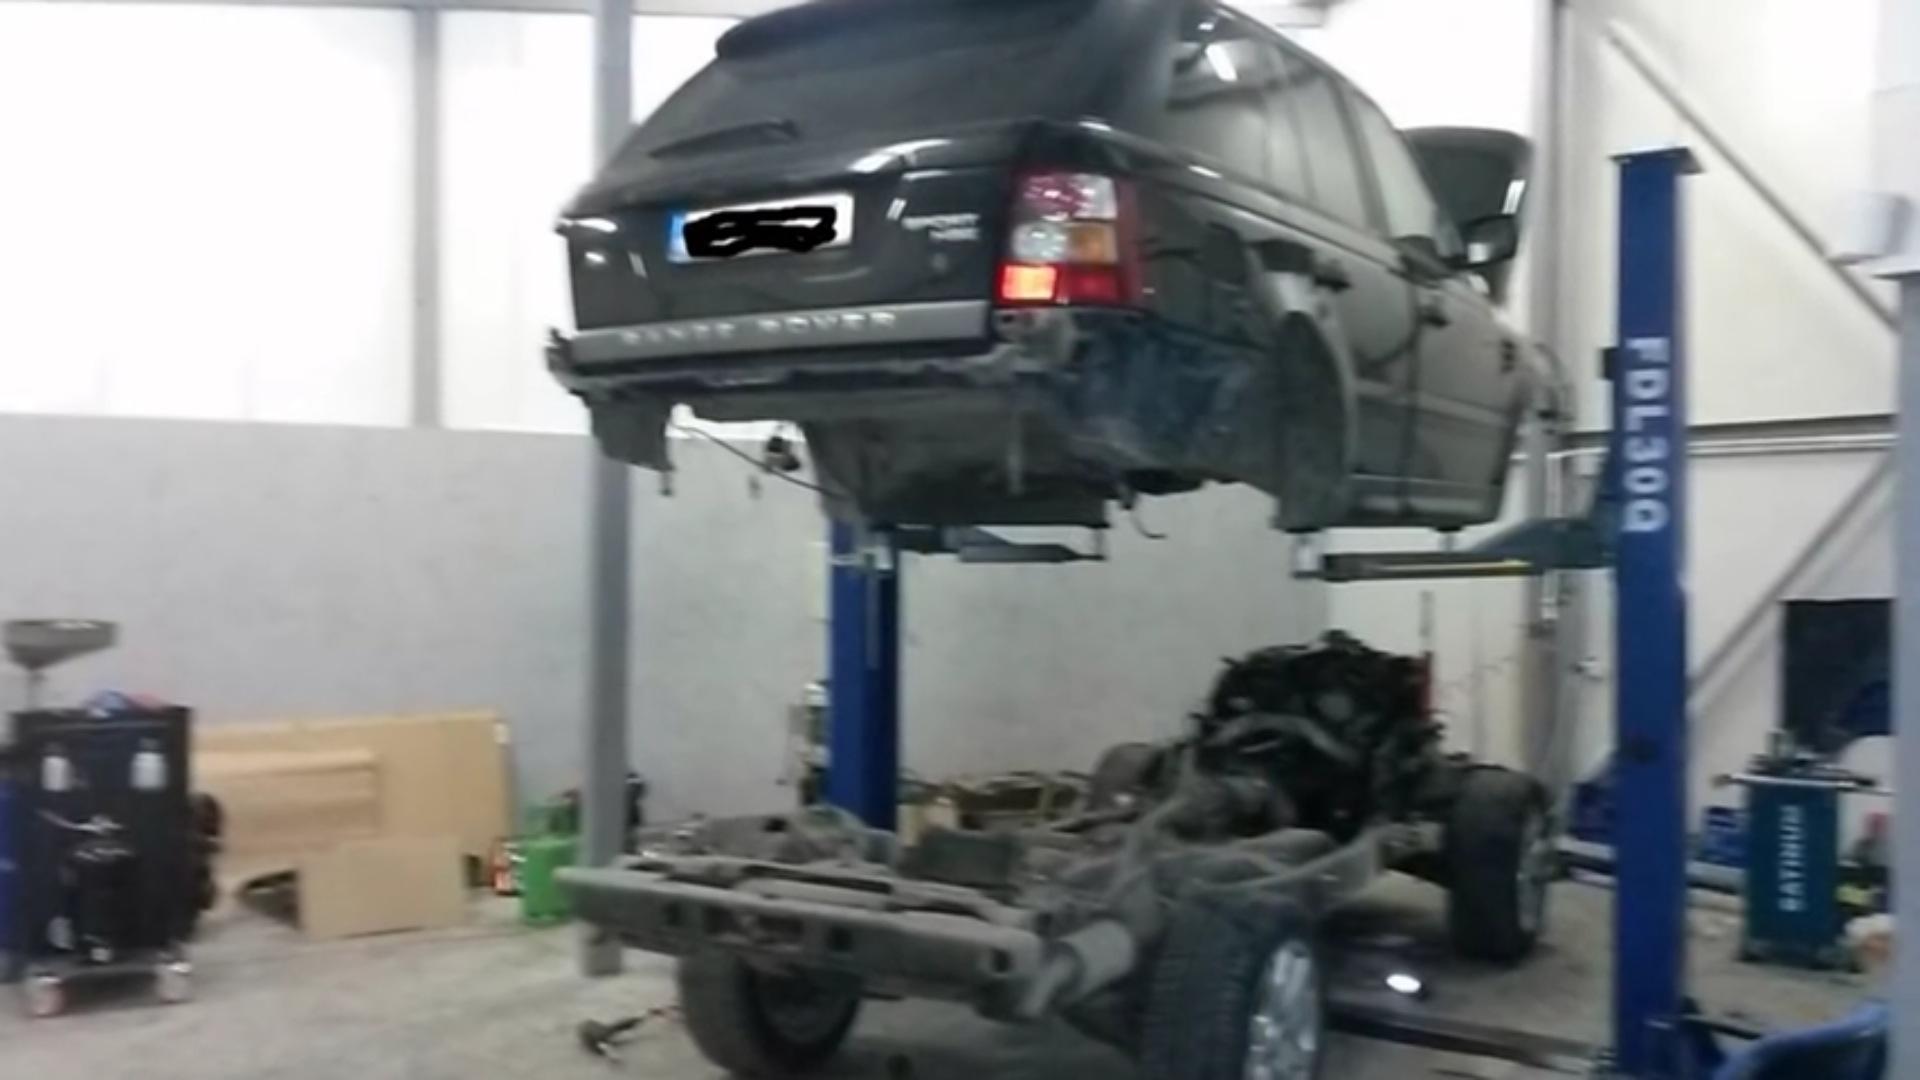 Range Rover Sport Split in Half by Mechanics Just to Repair the